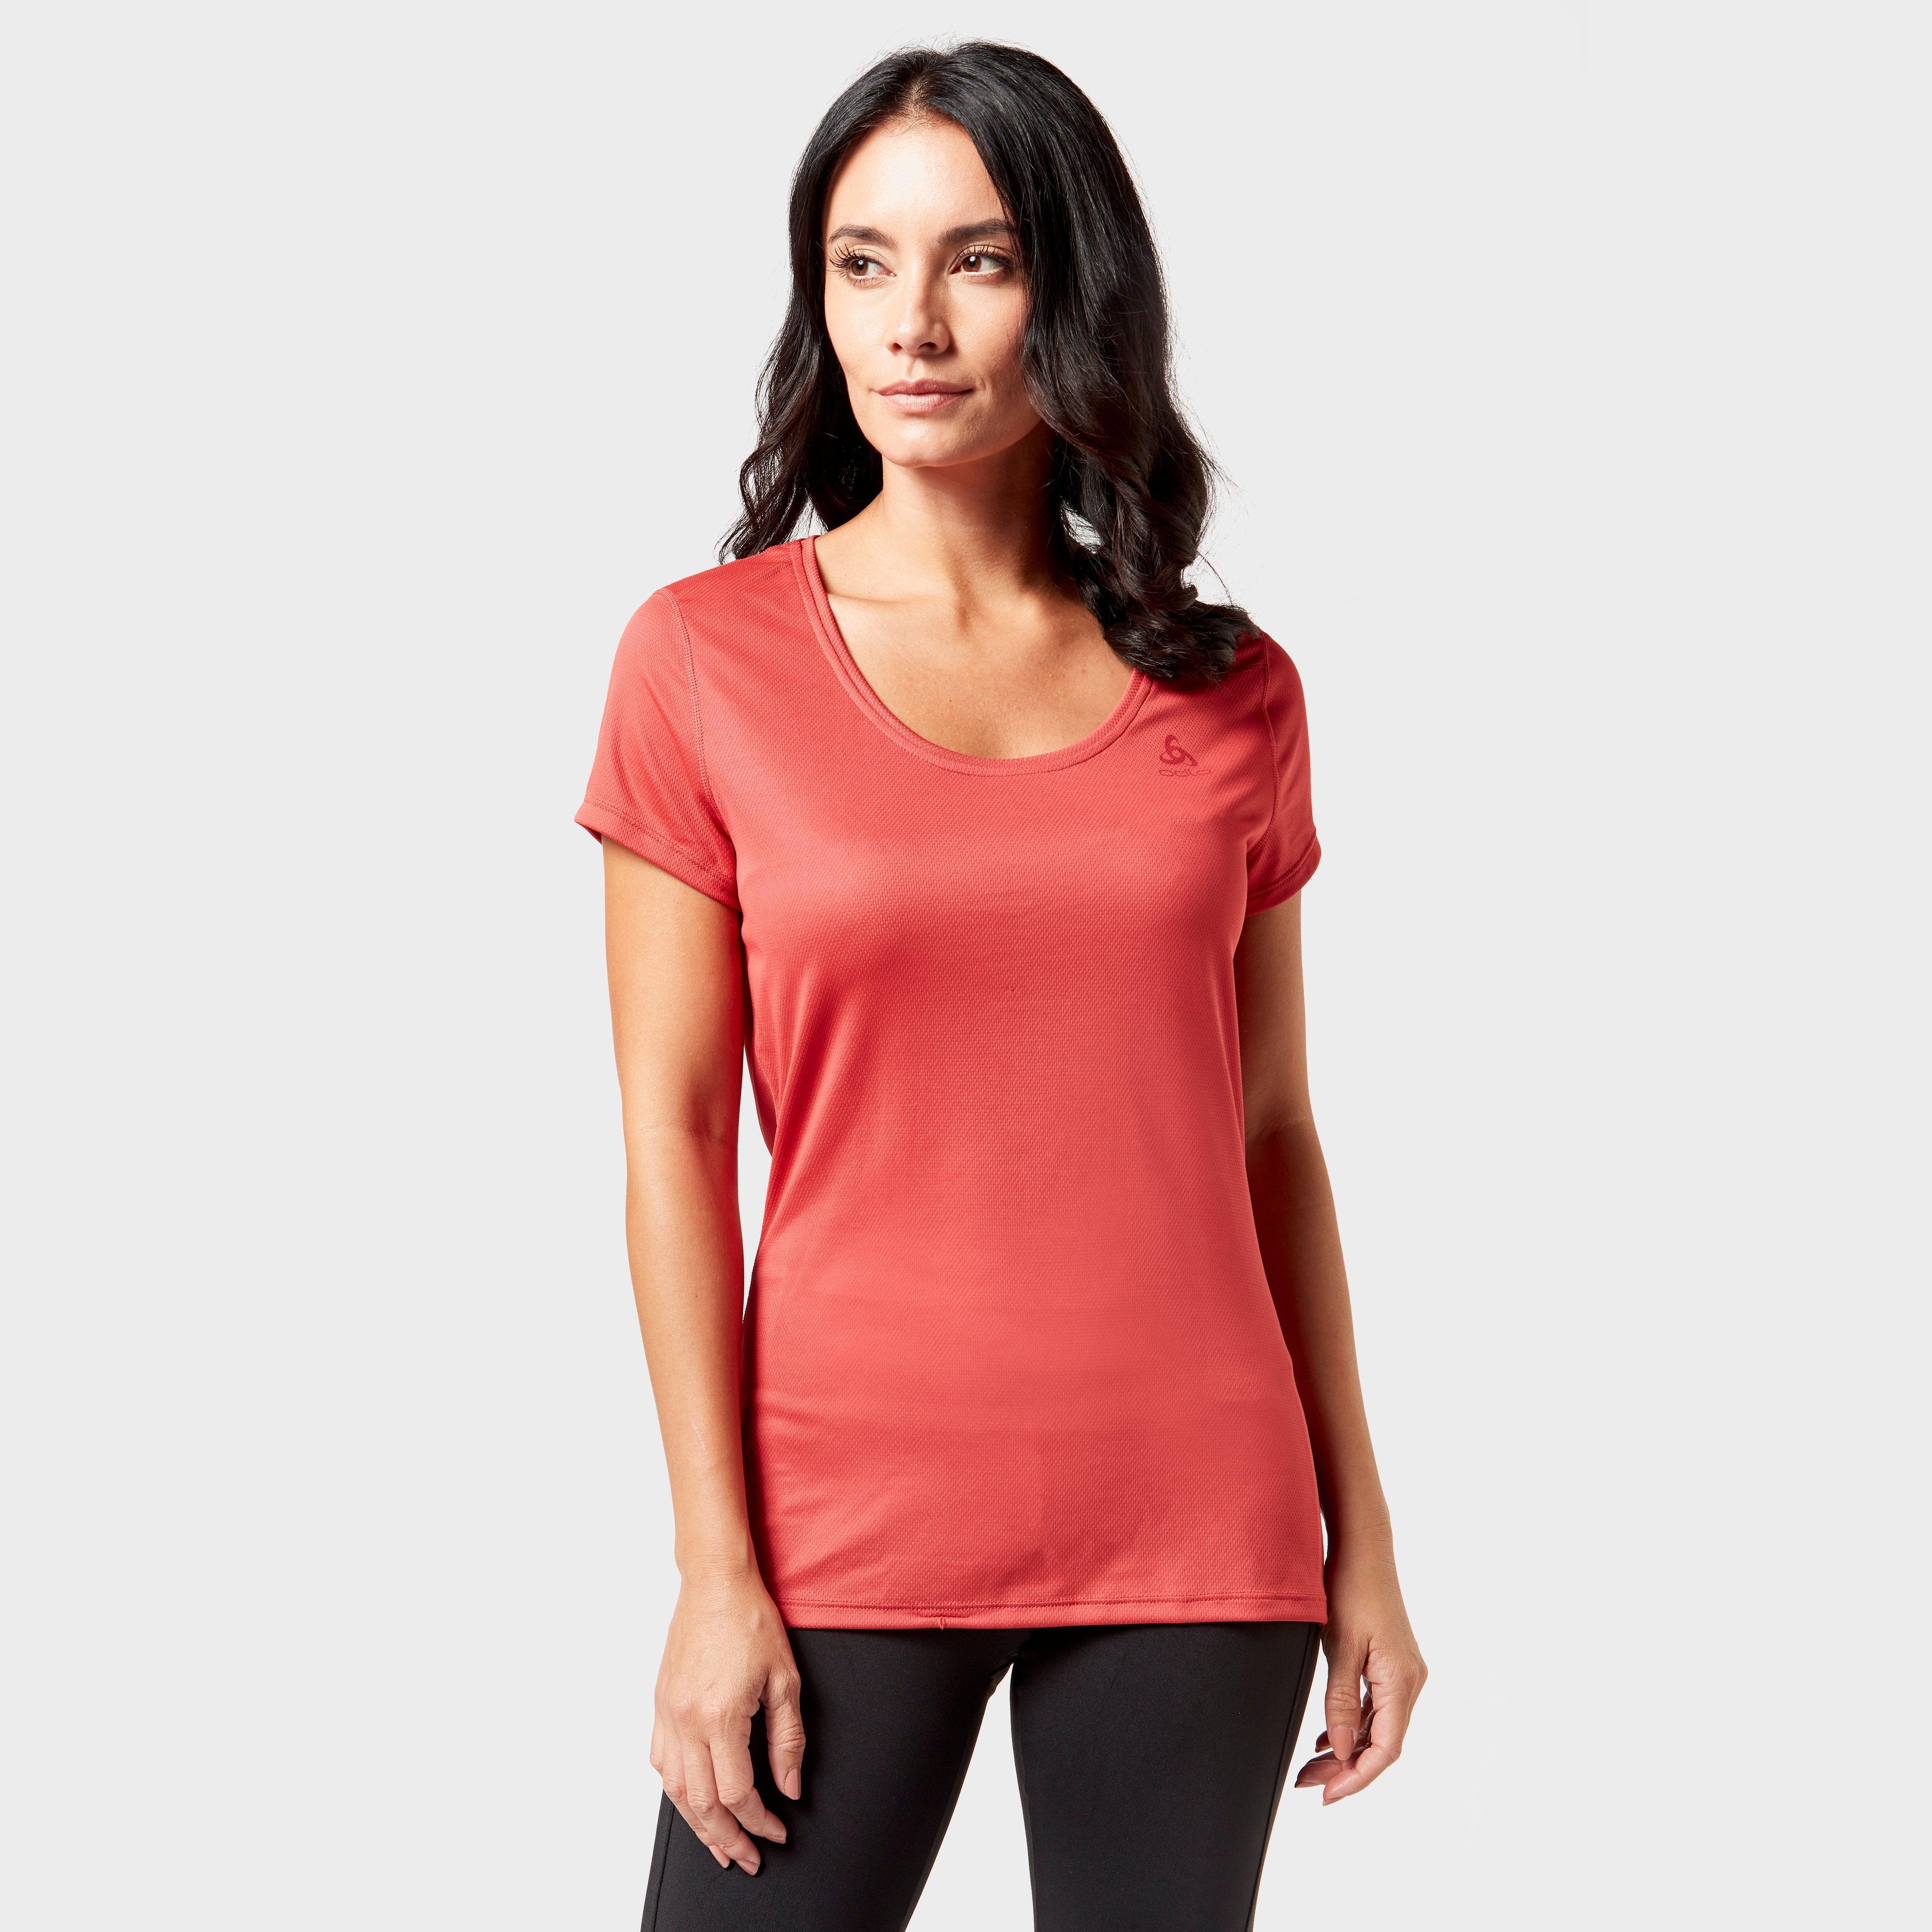 Odlo Women's Active F-Dry Light Baselayer T-Shirt, Pink